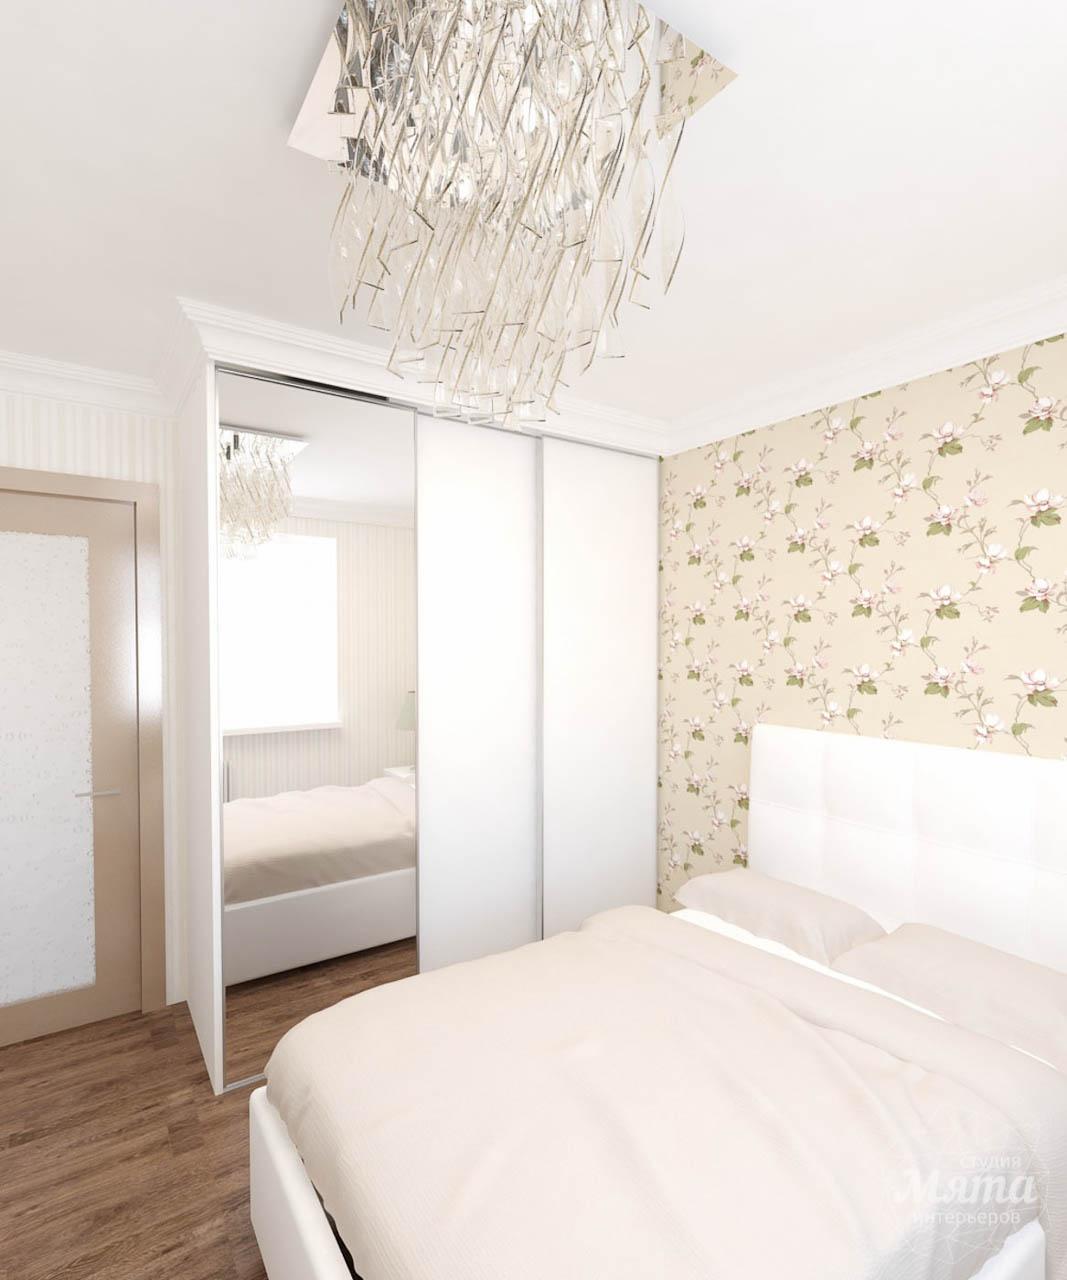 Дизайн интерьера и ремонт однокомнатной квартиры по ул. Бажова 134 img825175231